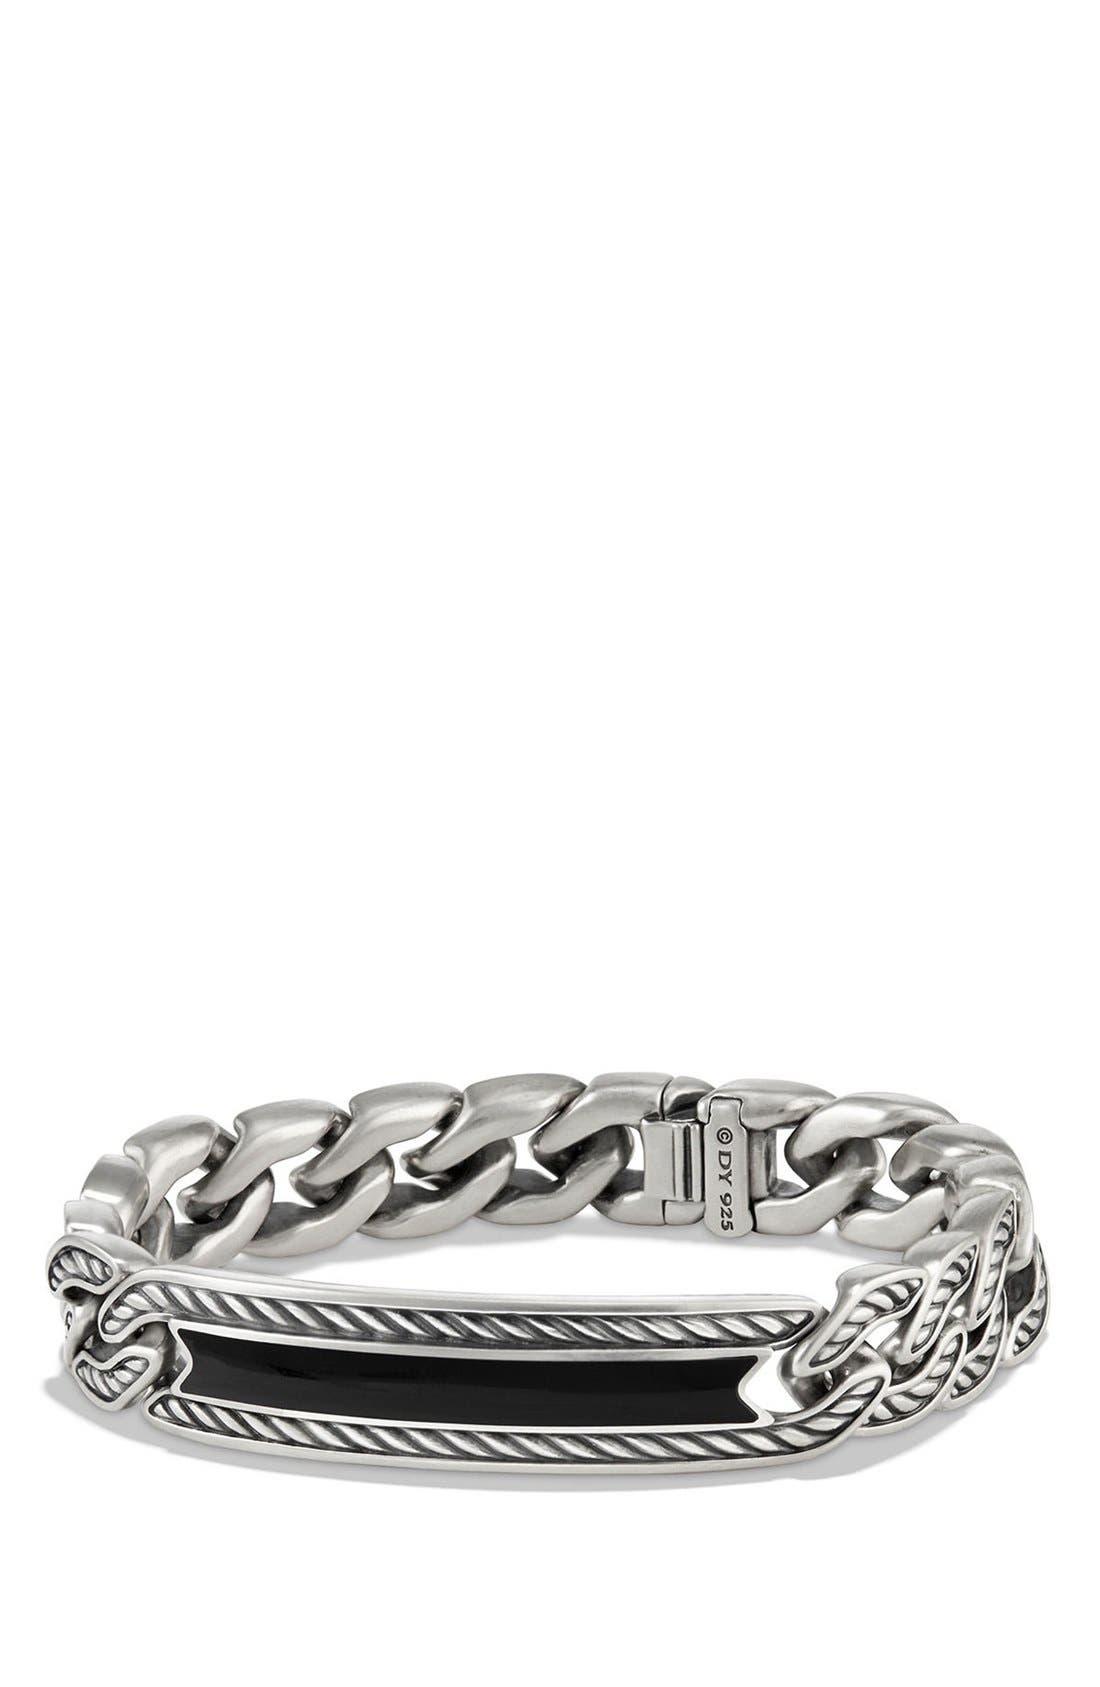 'Maritime' Curb Link ID Bracelet,                             Main thumbnail 1, color,                             SILVER/ BLACK ONYX